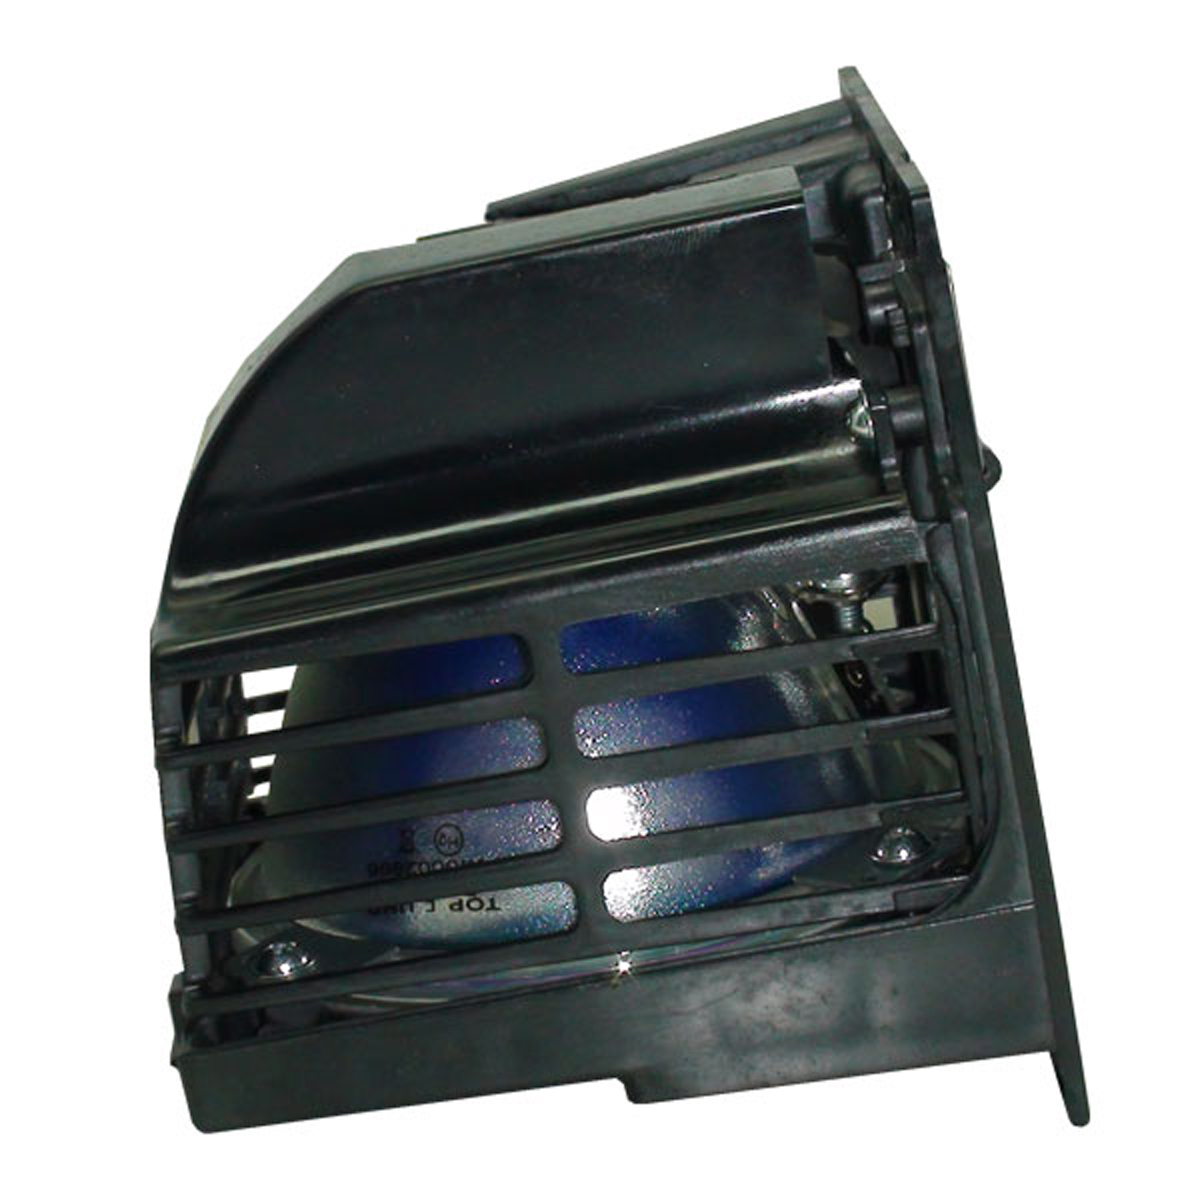 Mitsubishi 915P026010 / 915P026A10 DLP TV Lamp Bulb